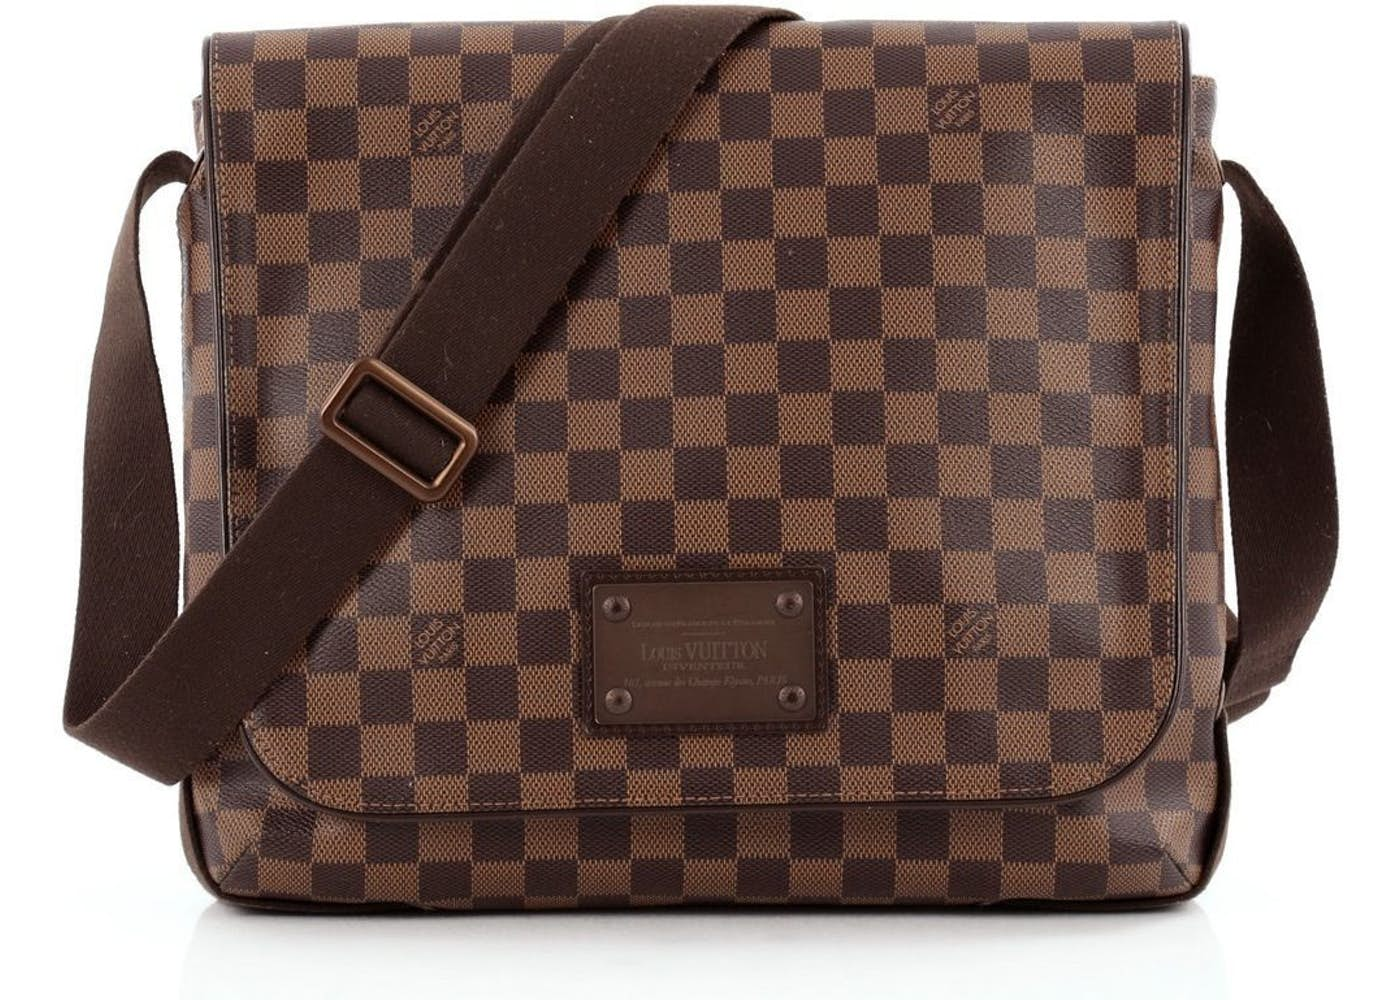 ac236e3cde96 Louis Vuitton Brooklyn Mm Damier Messenger Bag | HEWI London